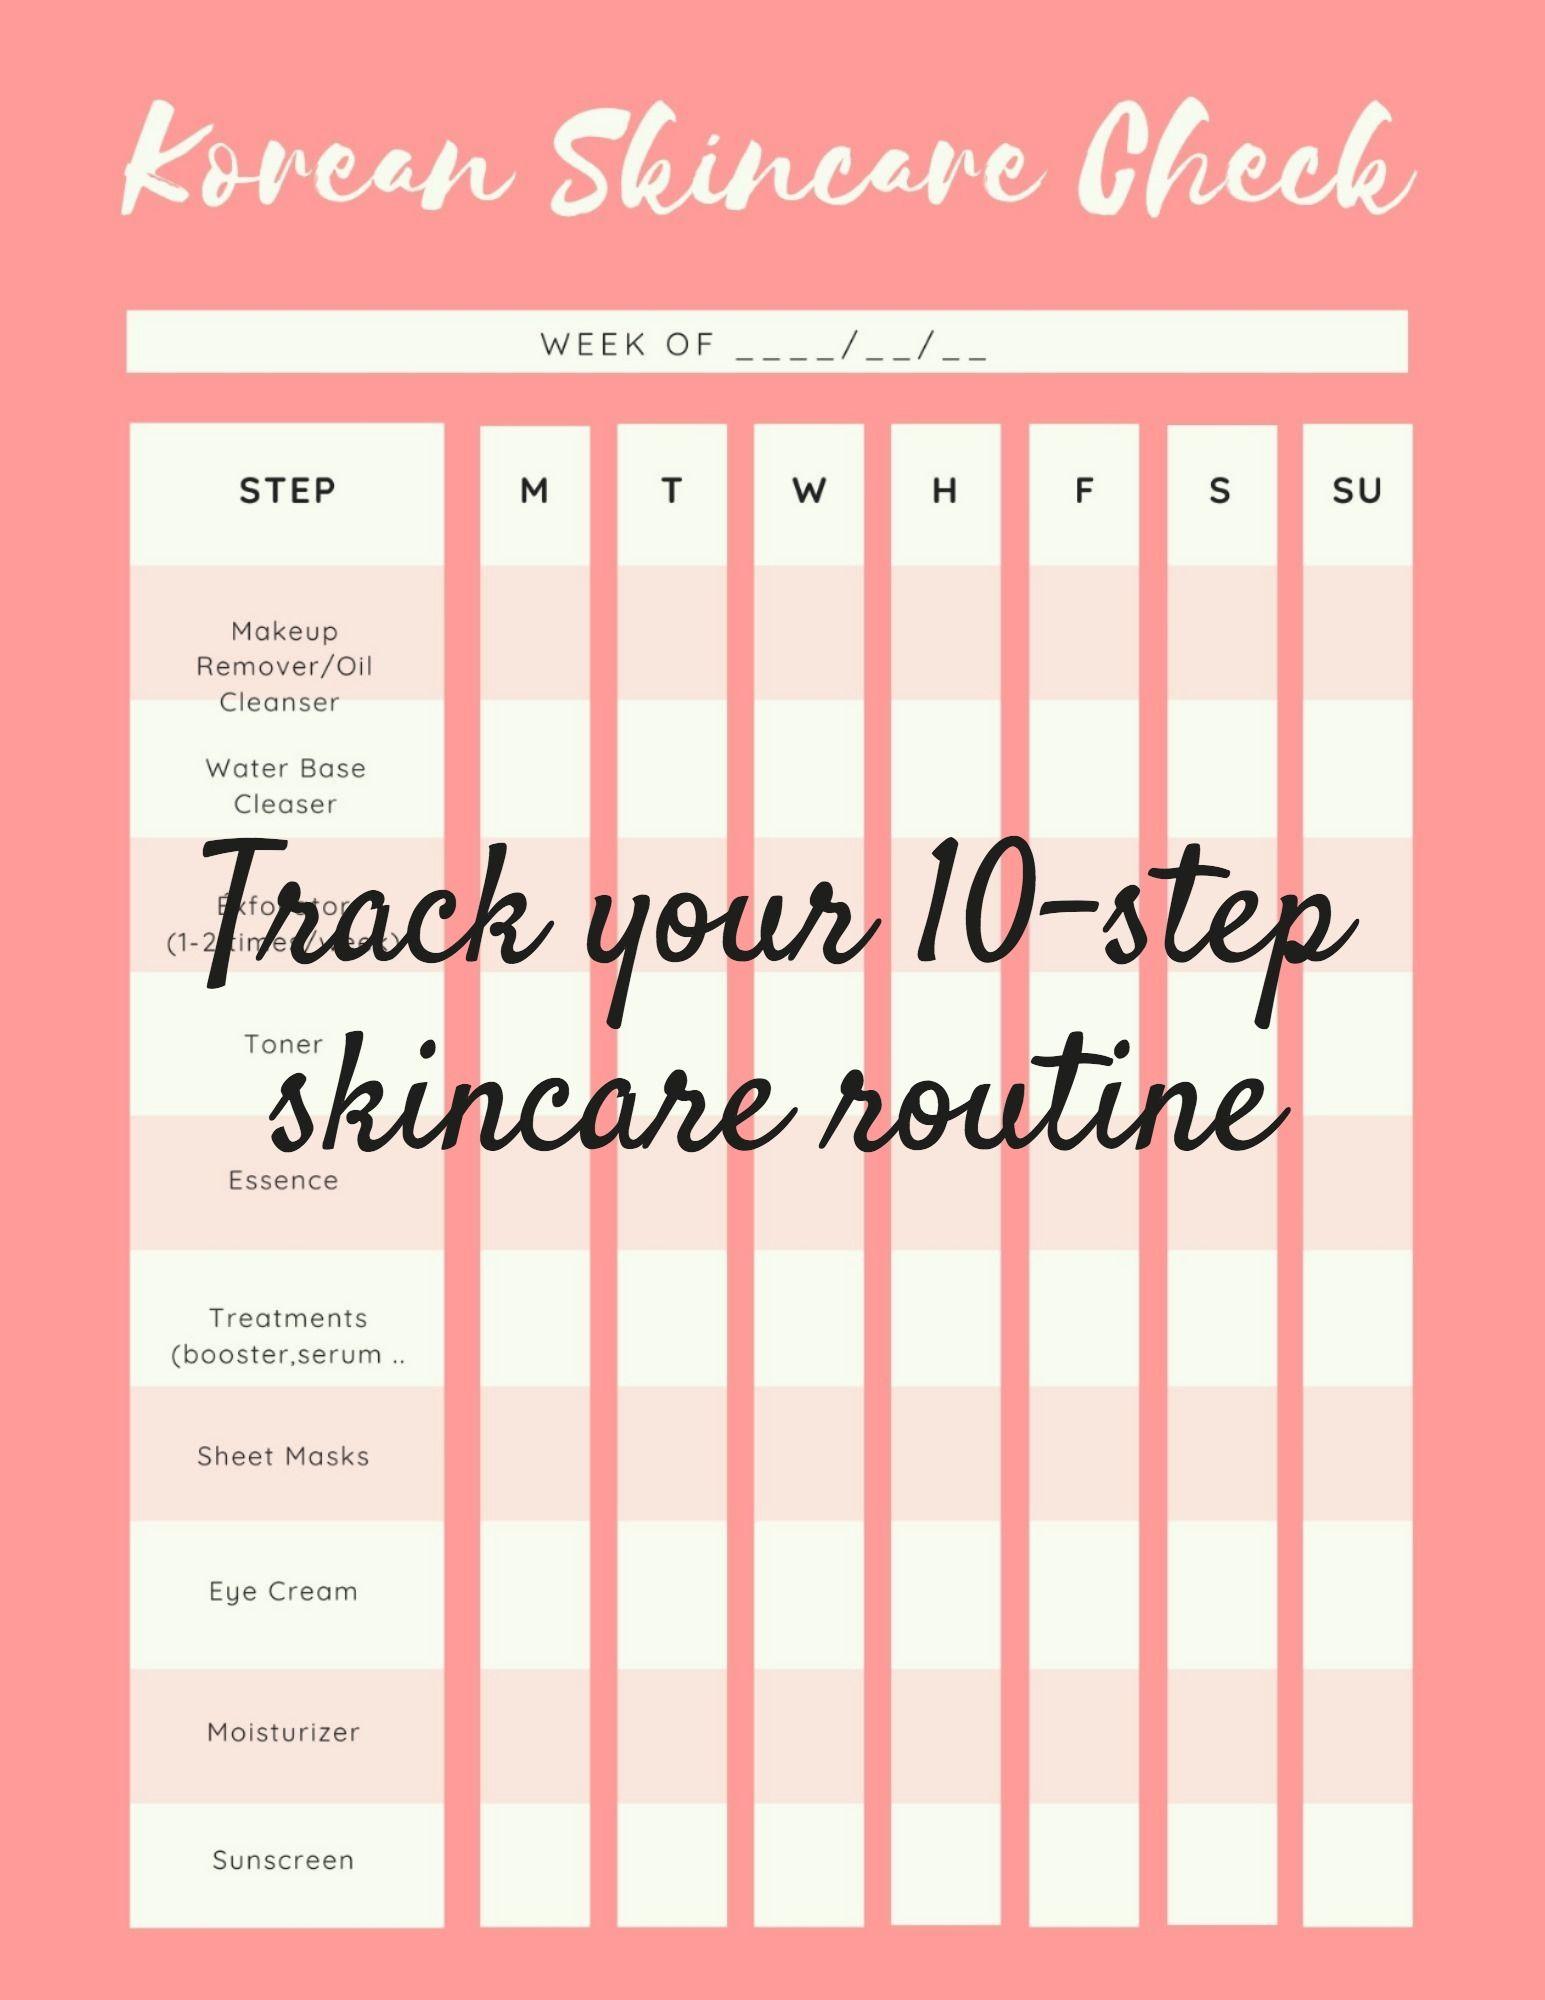 Never feel overwhelmed in front of all your products again. #skincare #routine #skincaretracker #koreanskincare #planner #printables